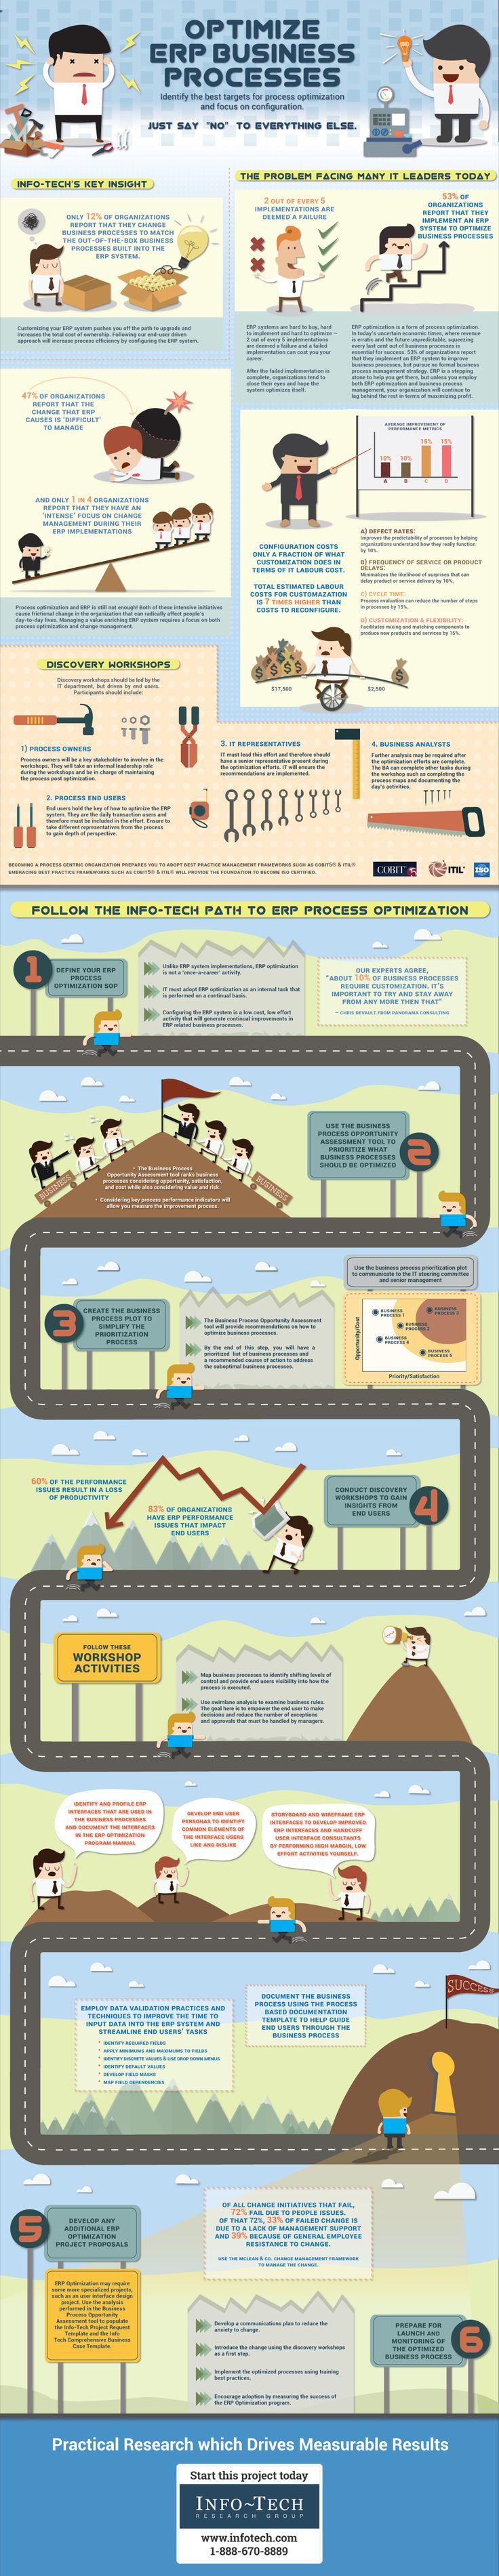 Infographic: Optimize ERP Business Processes